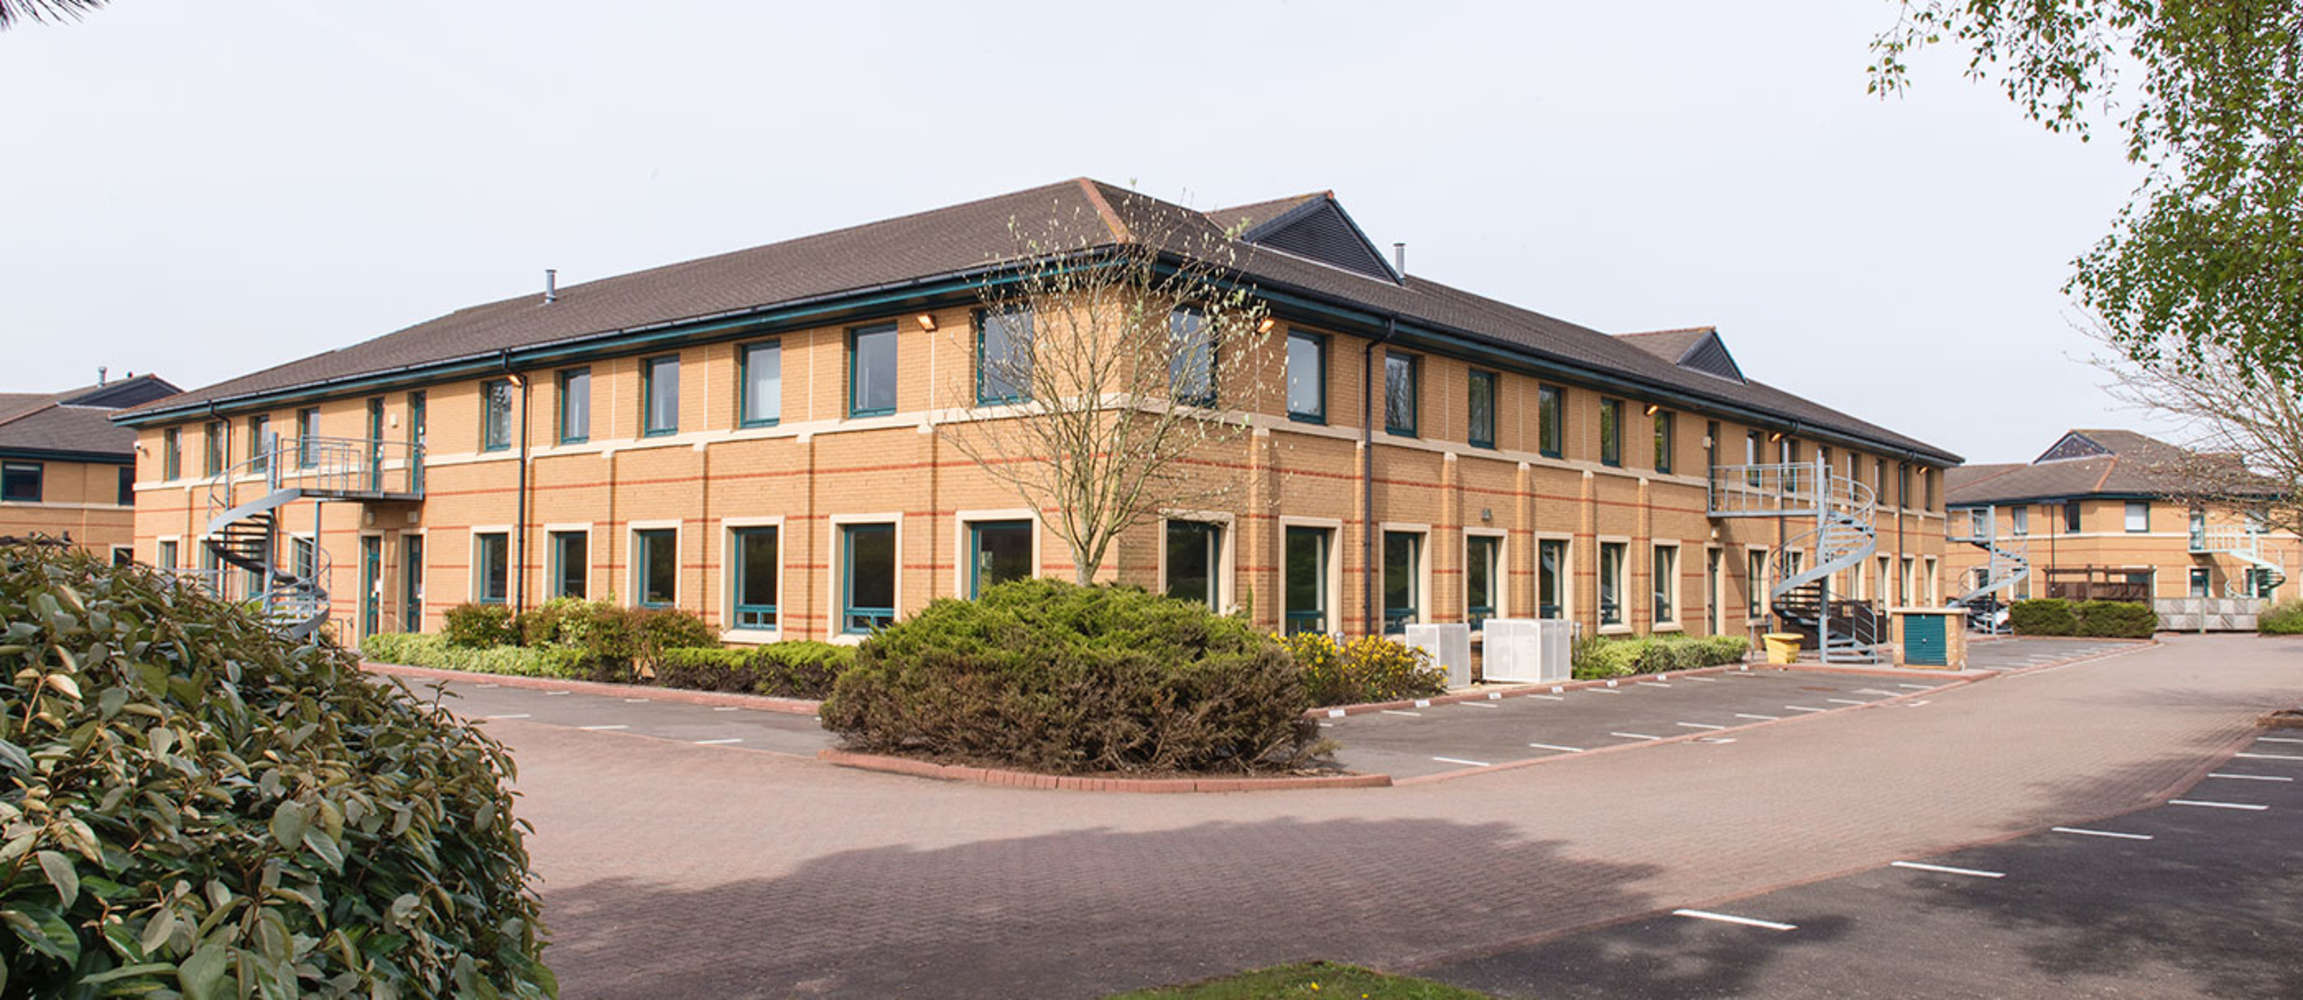 Office Birmingham, B37 7YE - 2670 Kings Court, Birmingham Business Park - 3